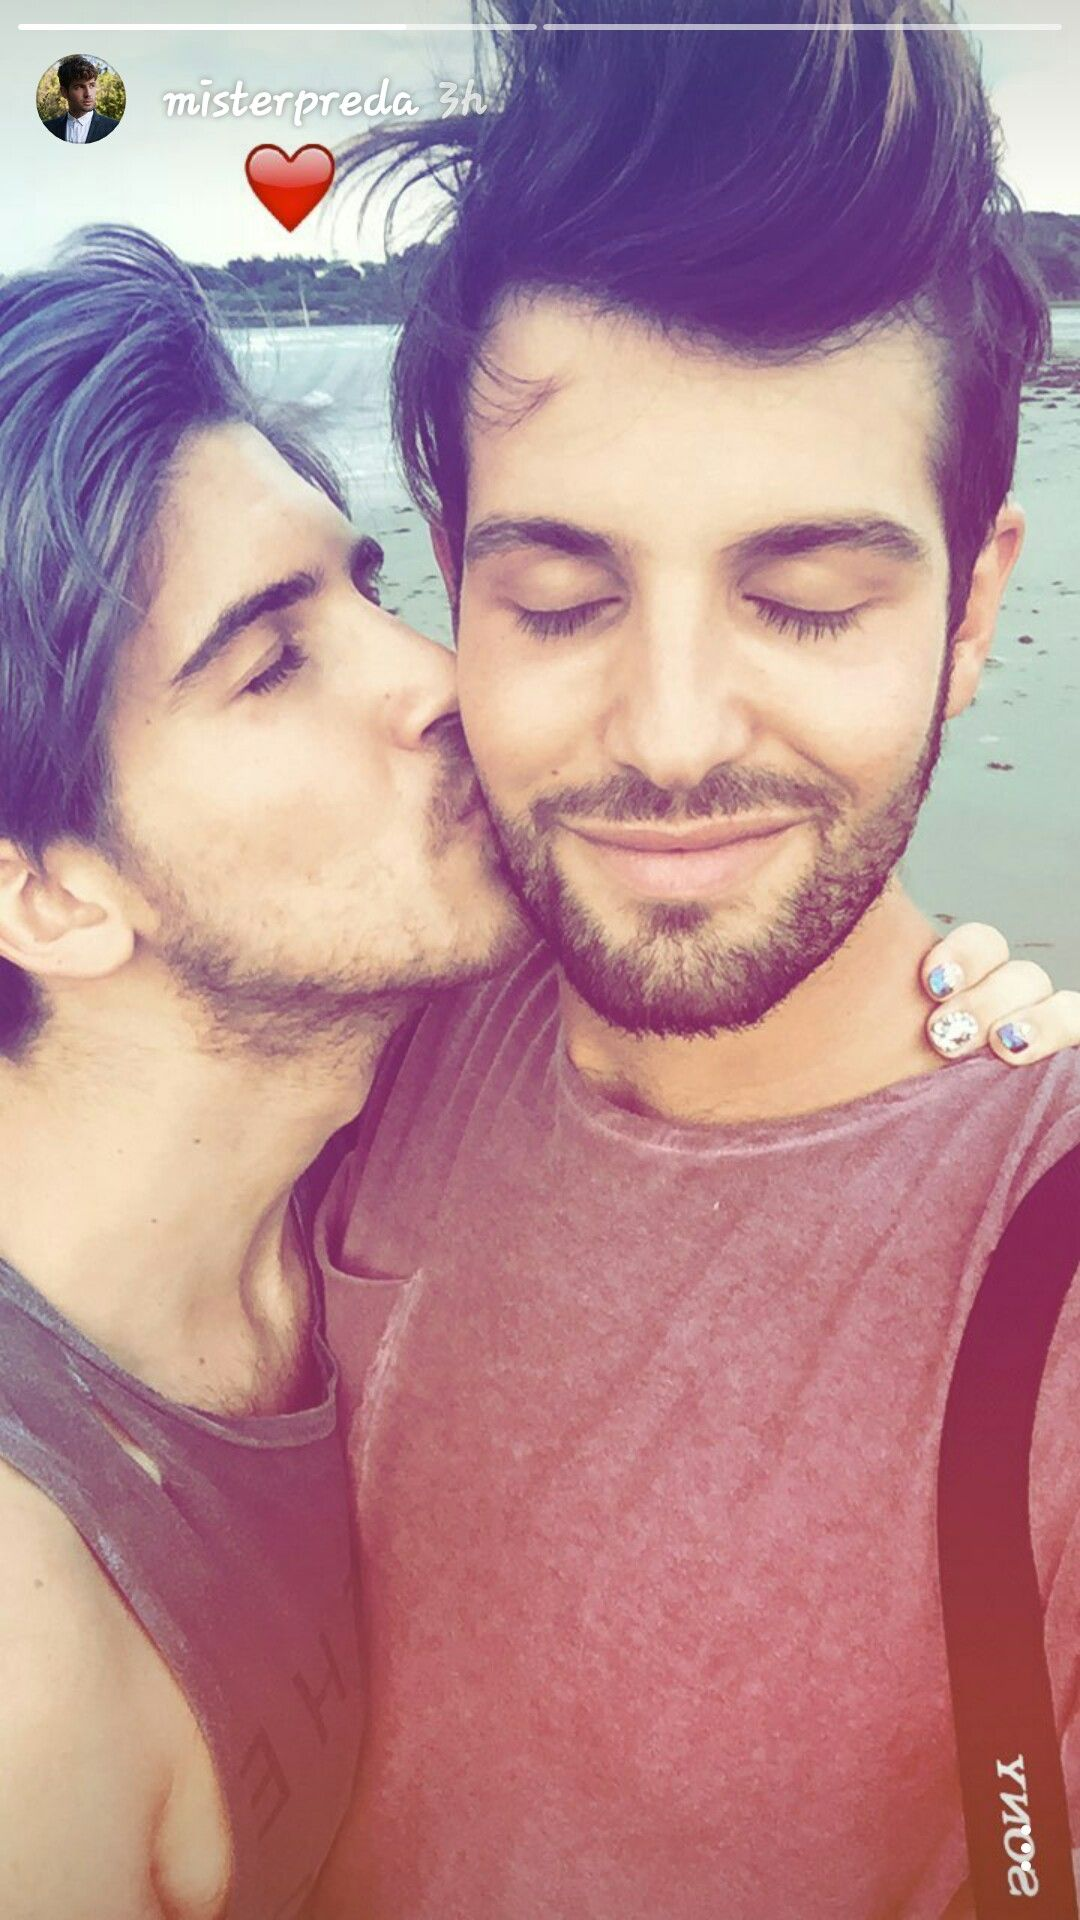 suosittu gay dating sites USA Bangalore dating chat-huoneet